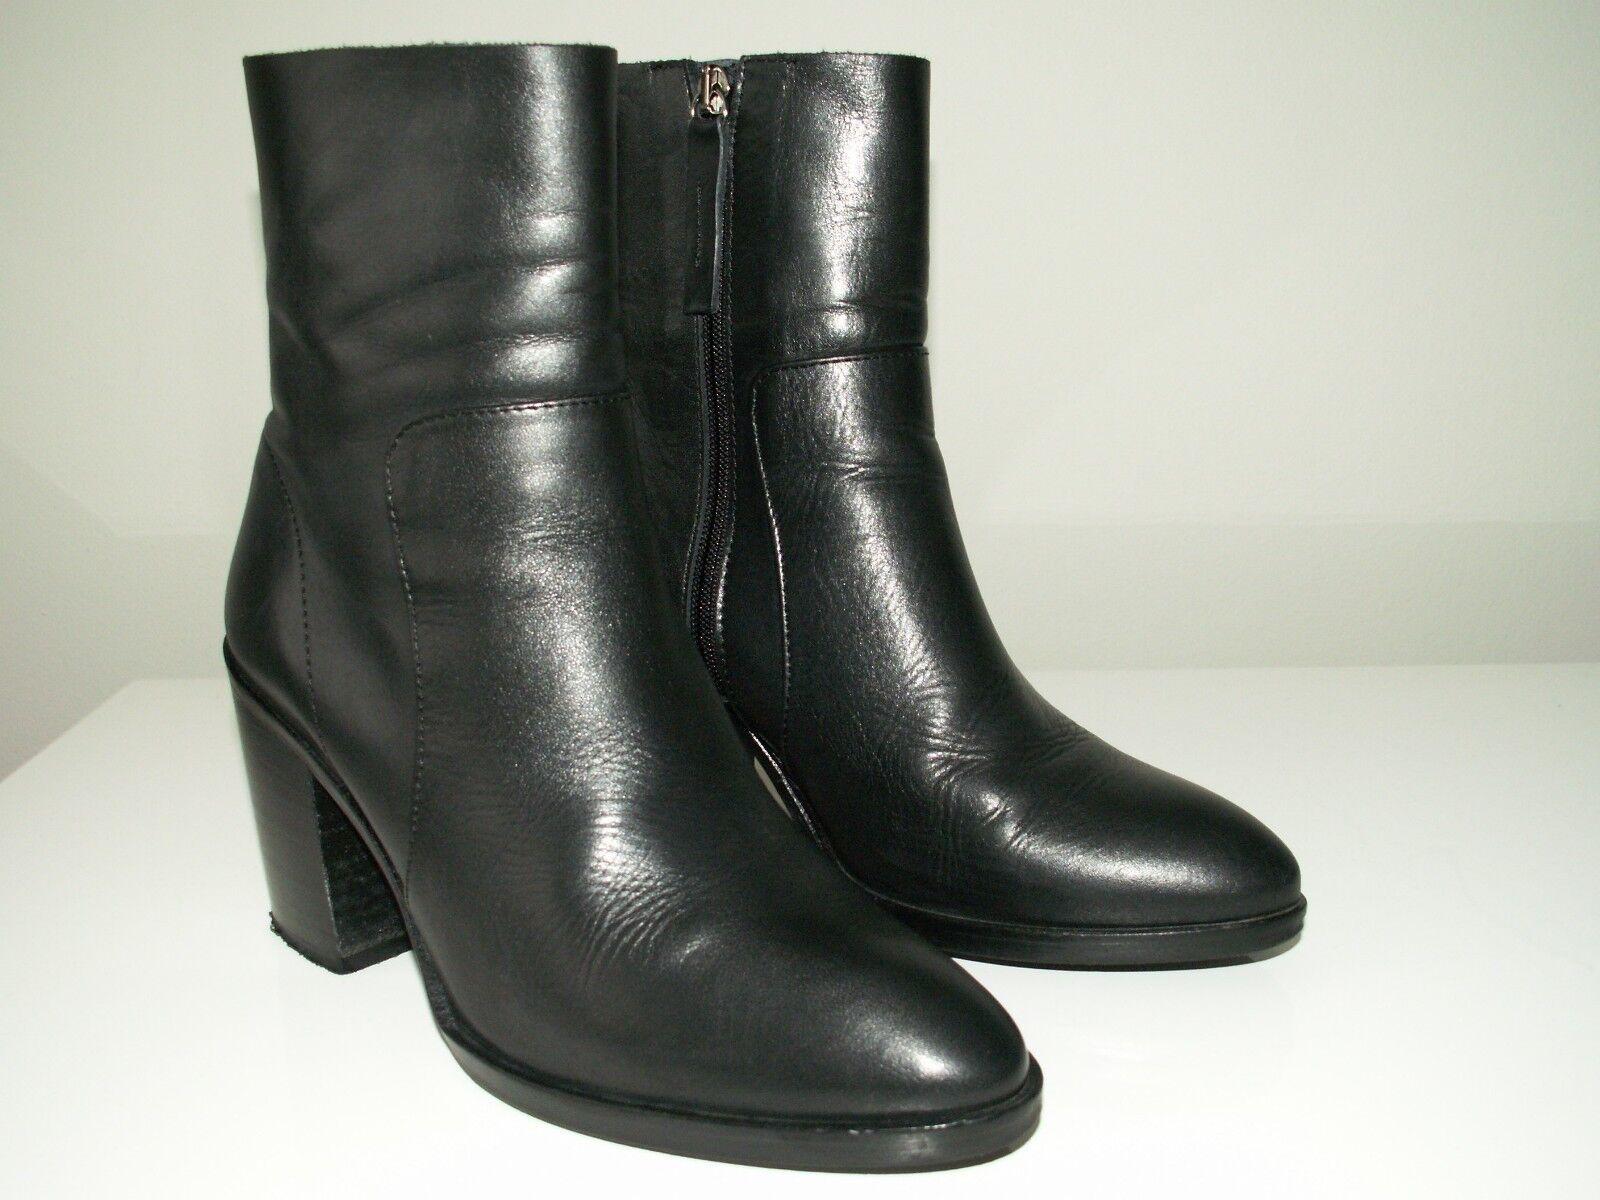 TOPSHOP 'million' black black black leather ankle sock boots uk 4 eu 37 us 6.5 f9d9da